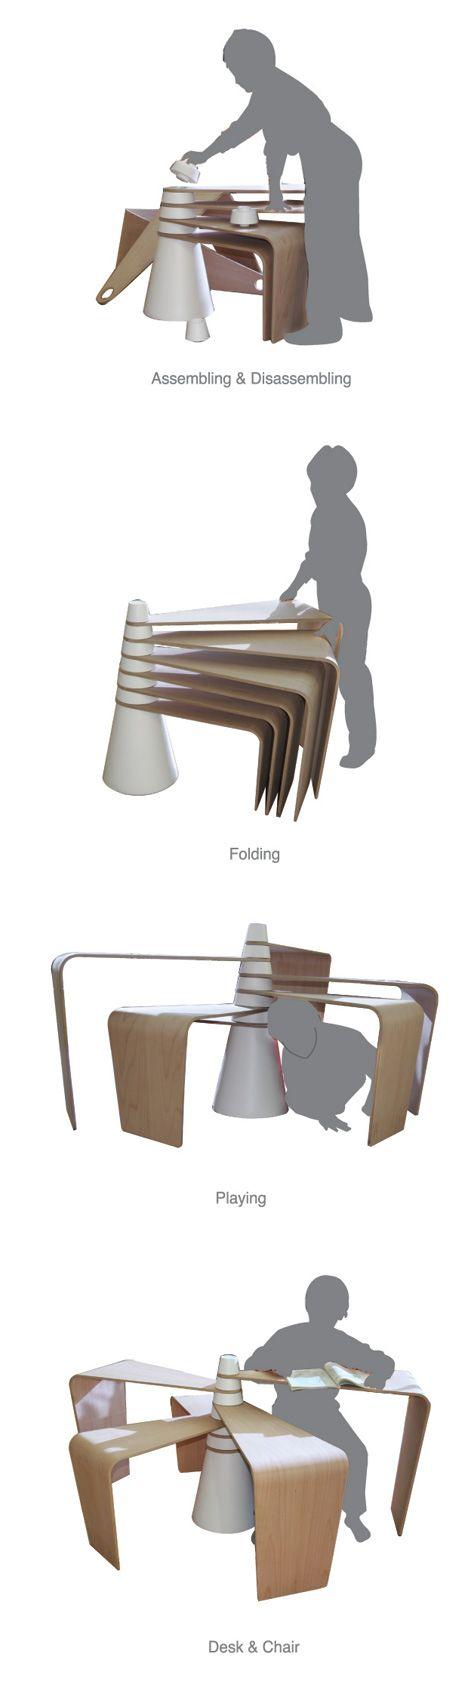 Multi Functional Furniture family multifunctional furniturejin-young lee